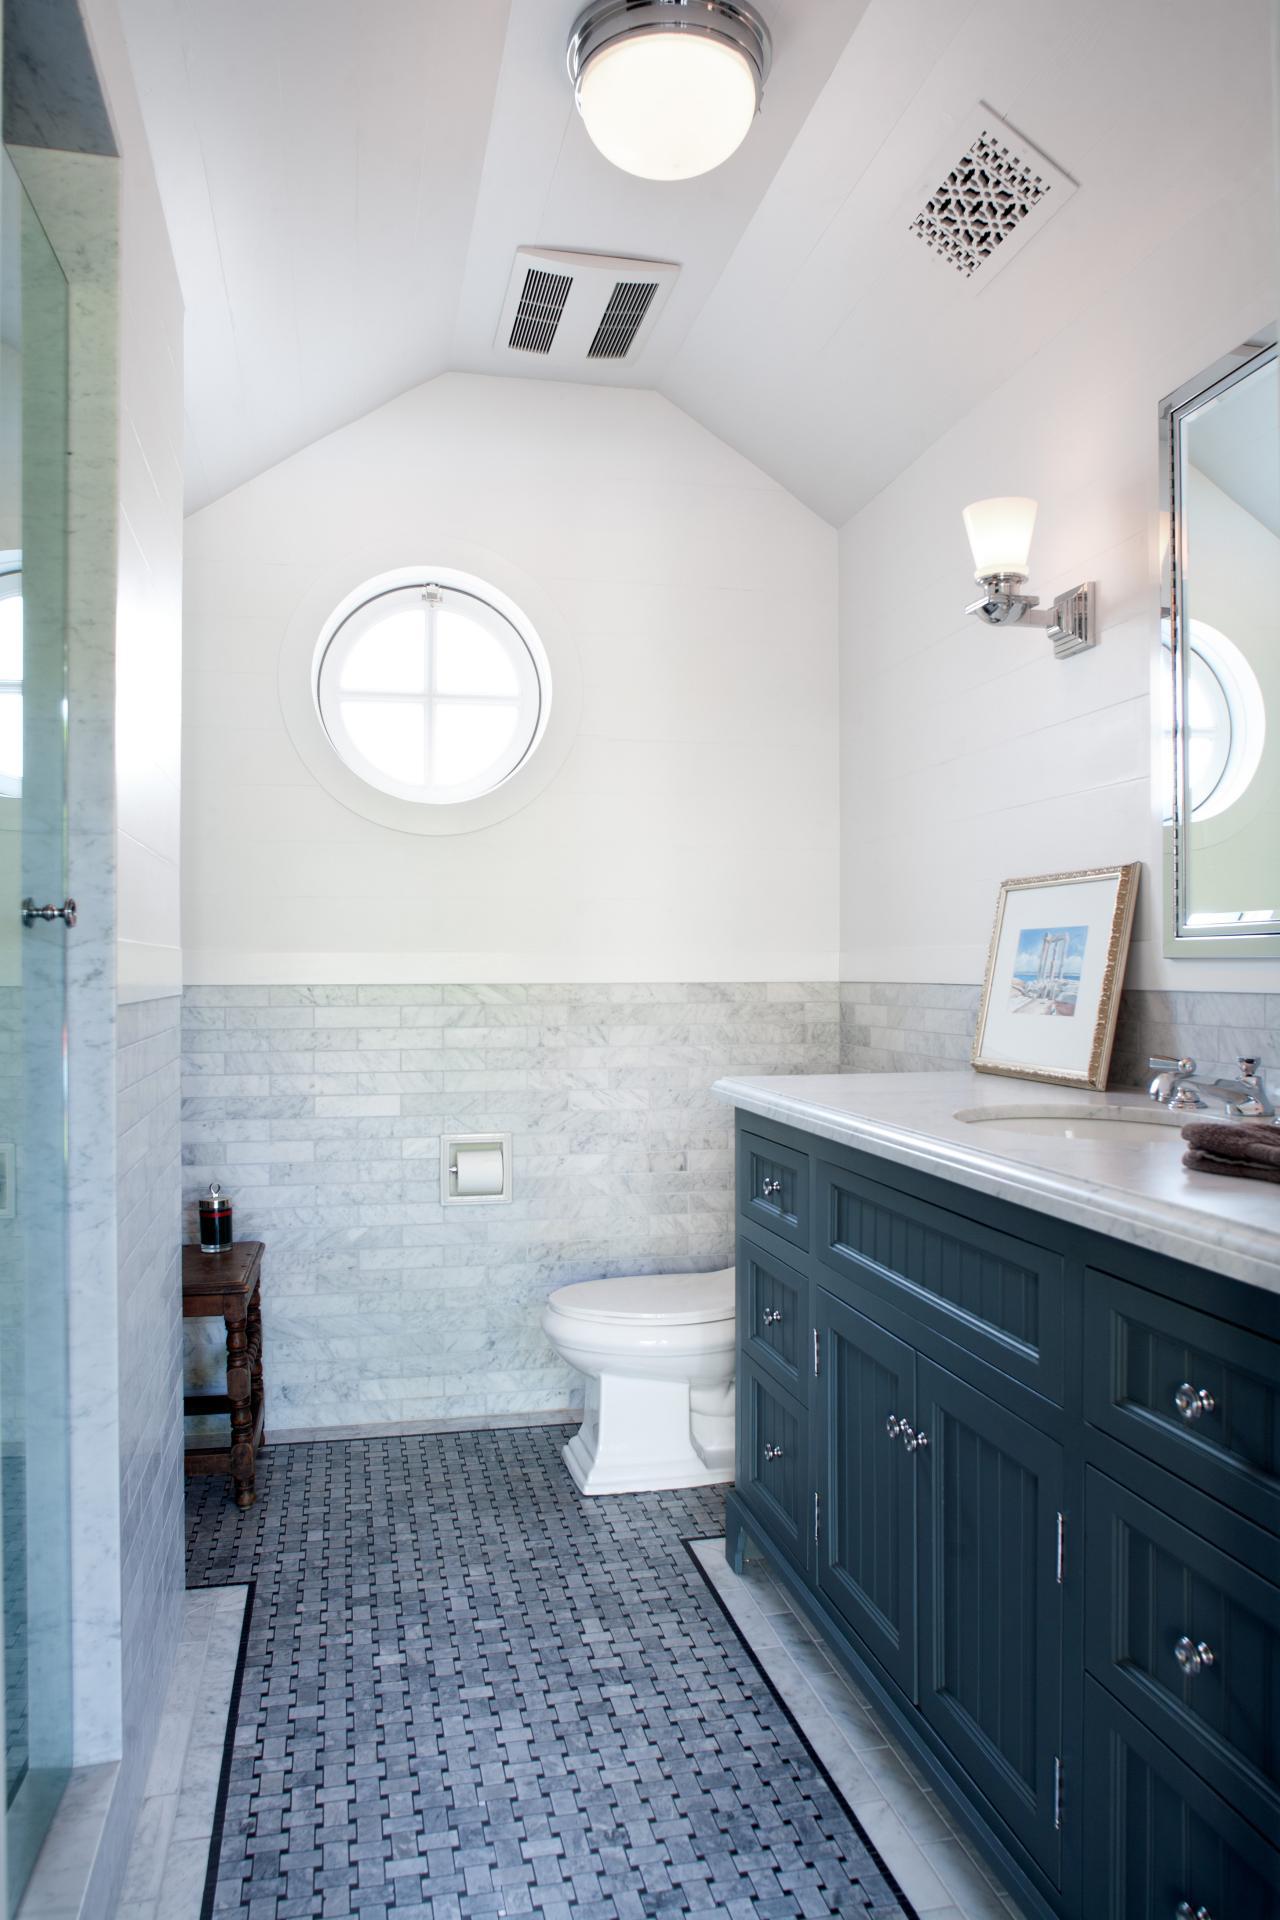 bathroom flooring ideas basketweave tile on bathroom floor ADXIKPL